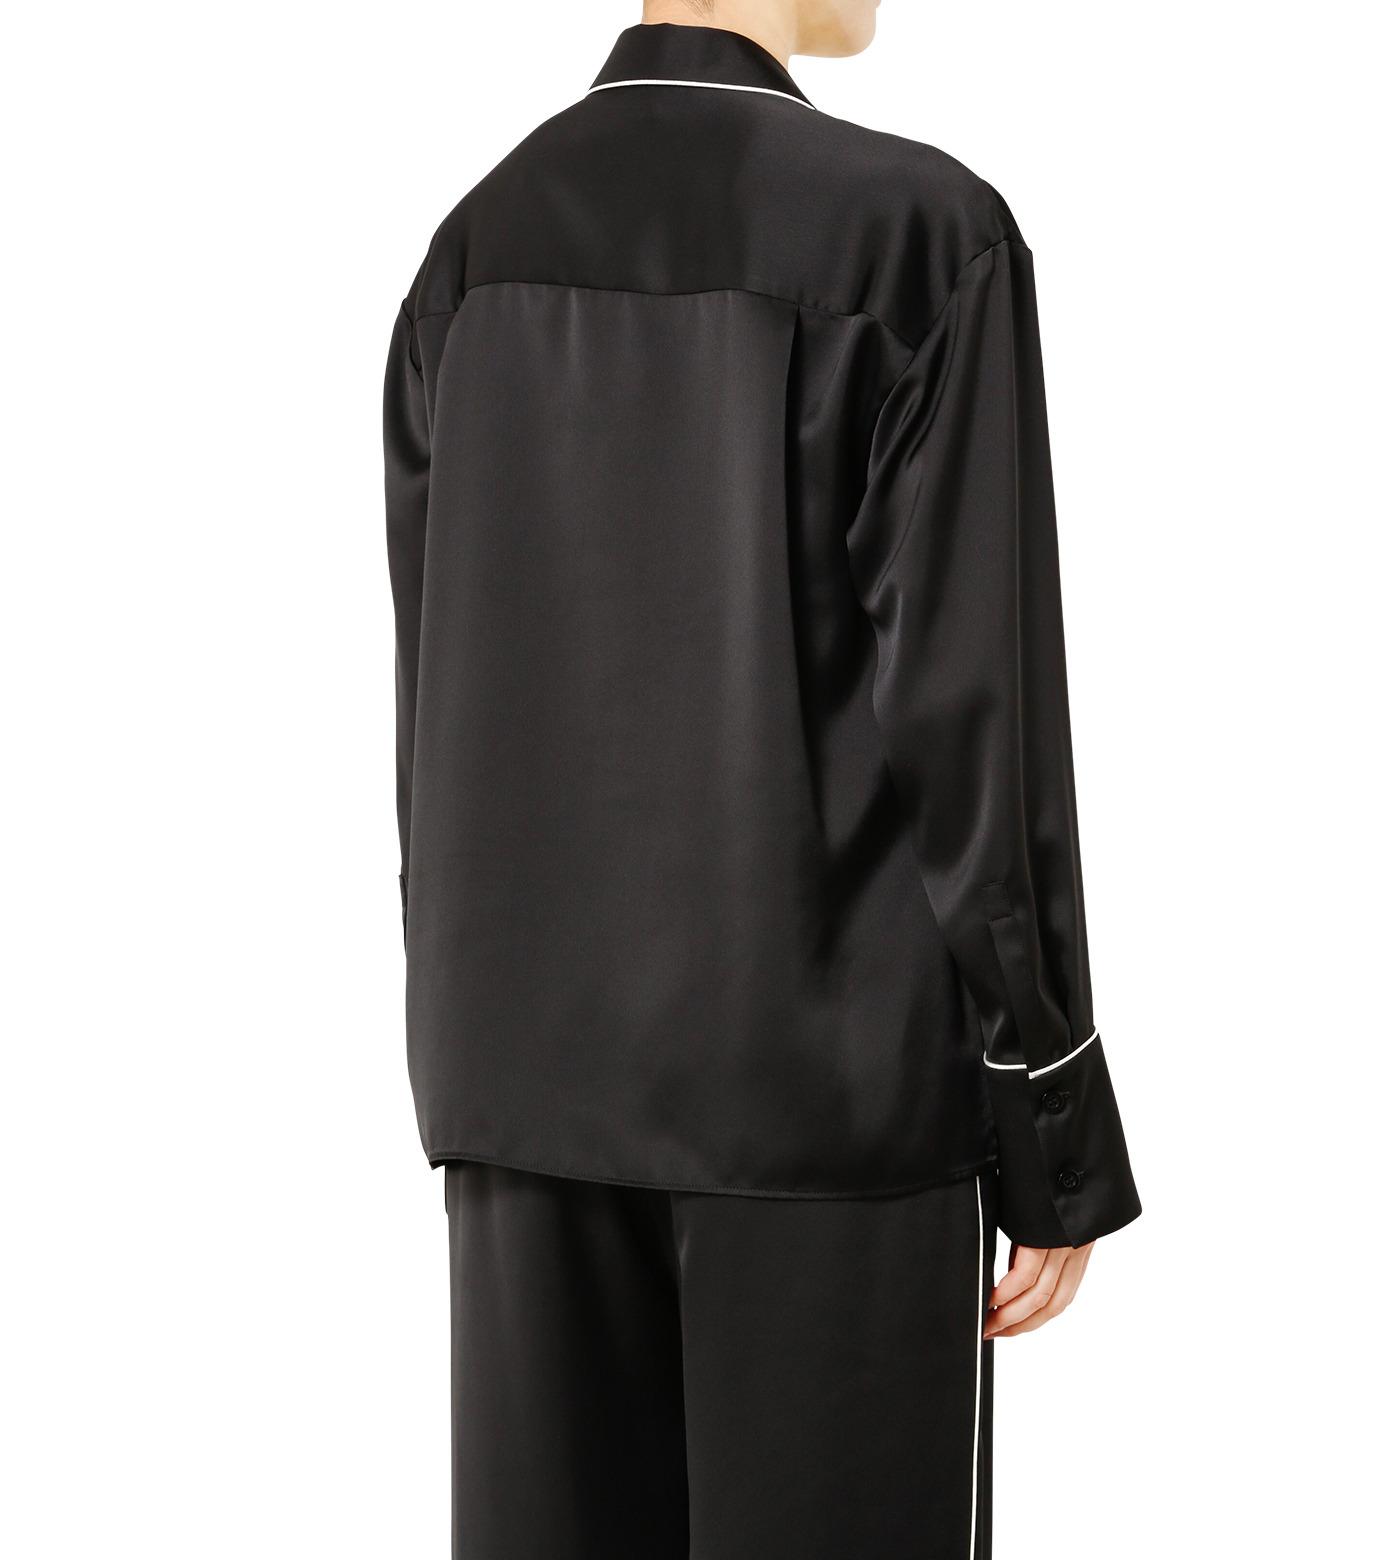 LE CIEL BLEU(ルシェルブルー)のパジャマルックシャツ-BLACK(シャツ/shirt)-19S63101 拡大詳細画像4